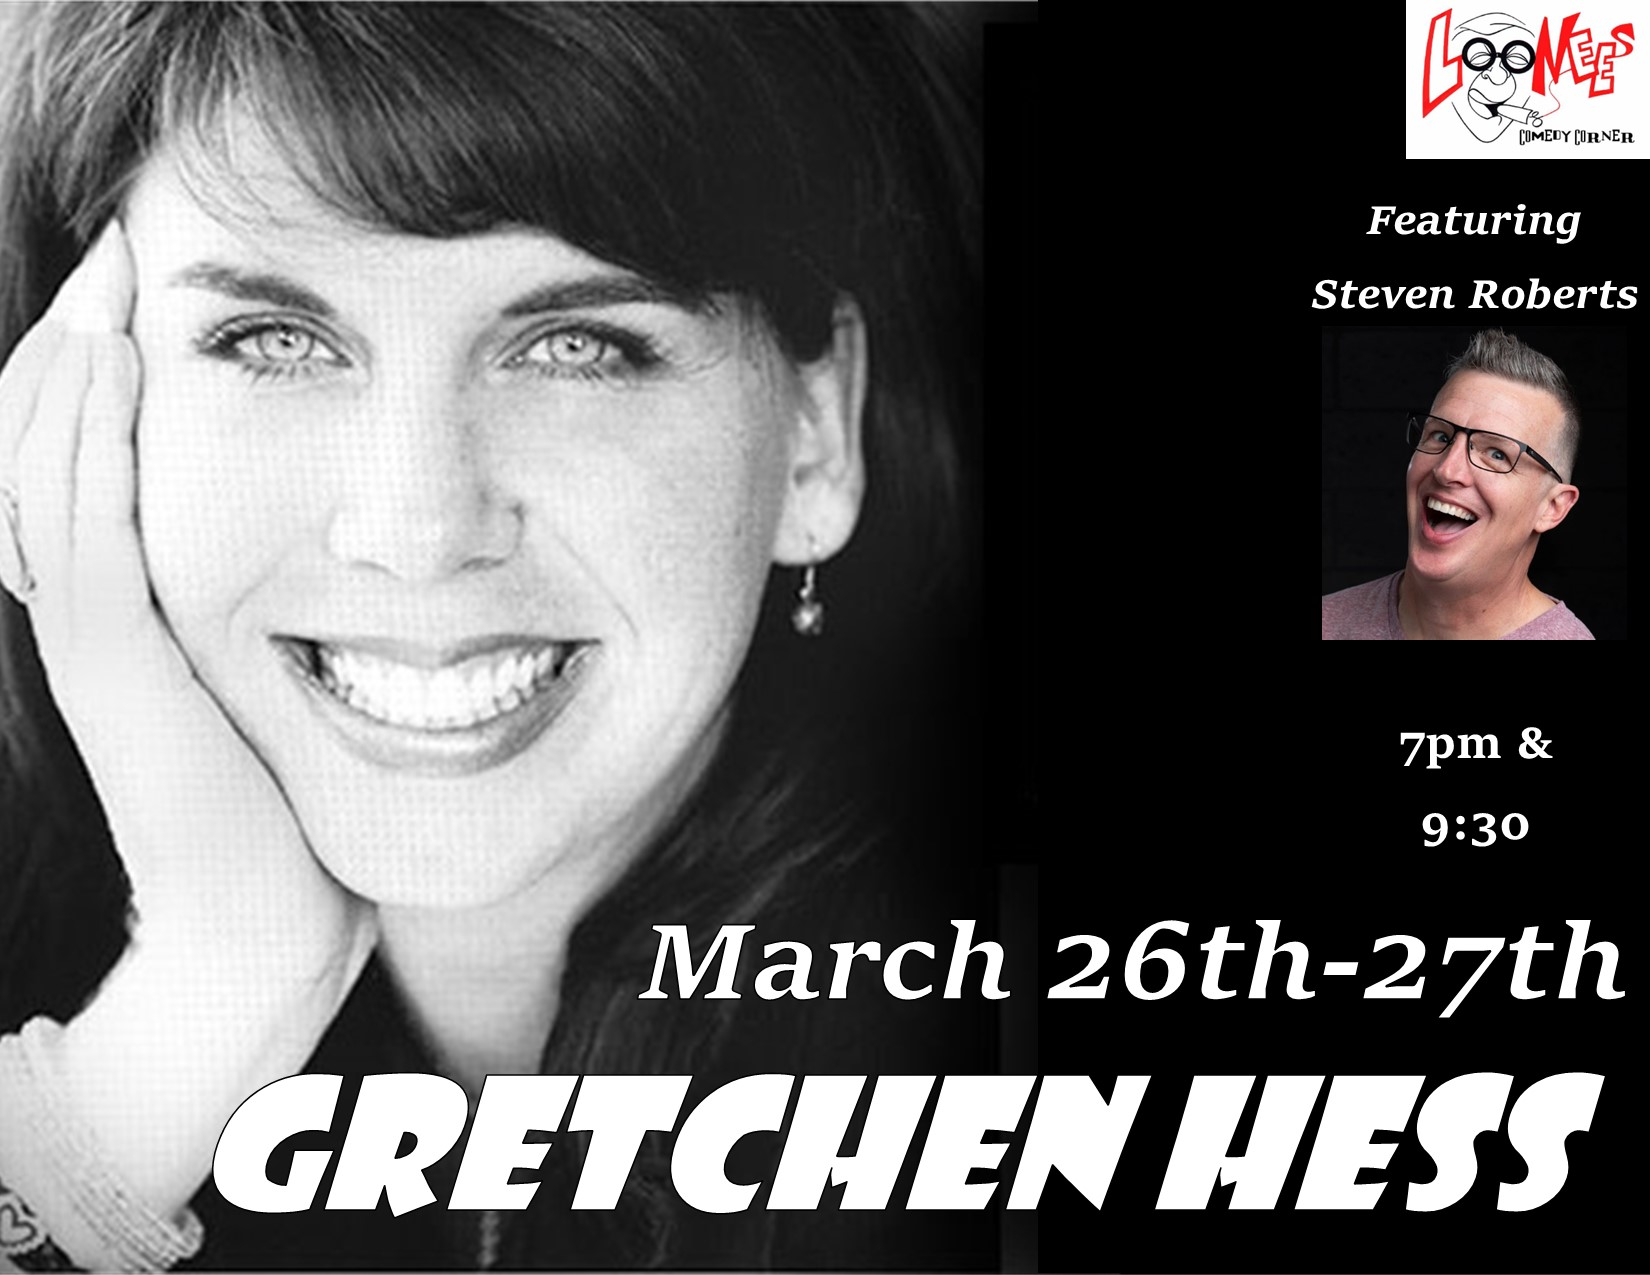 Gretchen Hess